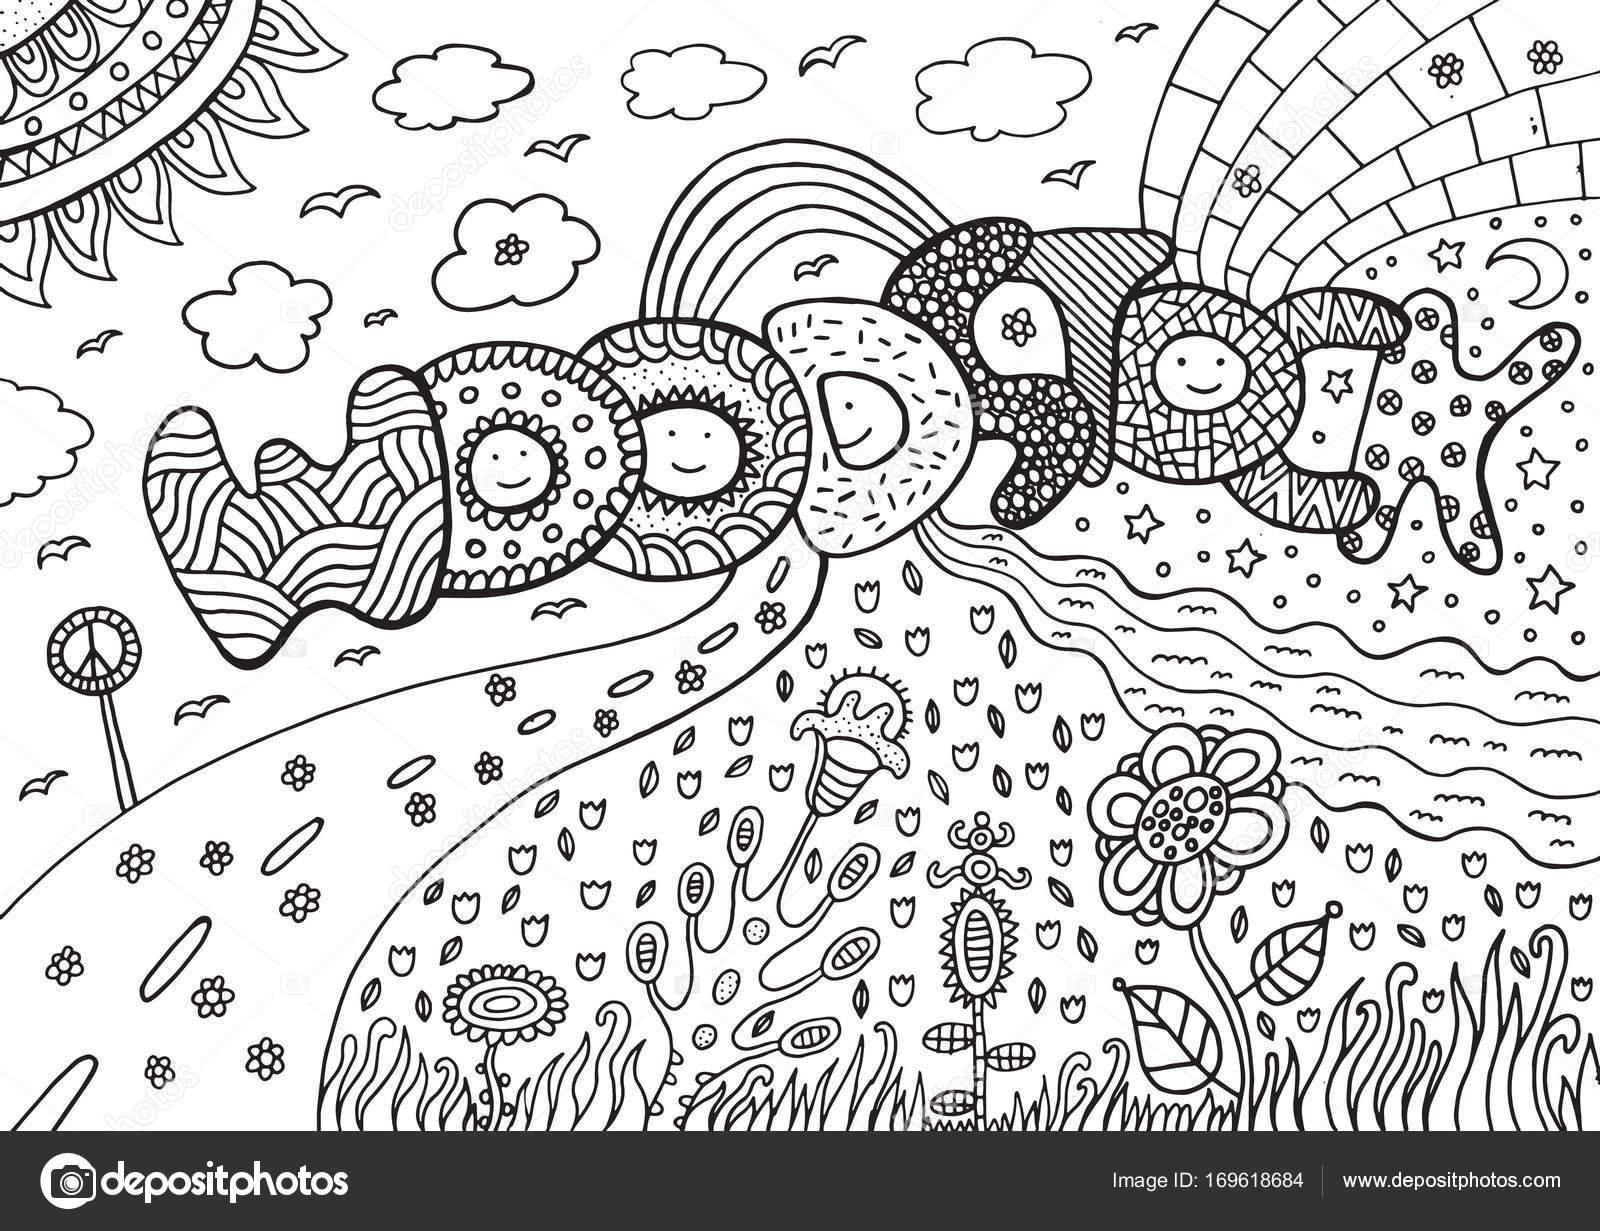 Malvorlagen mit Woodstock Wort — Stockvektor © fesleen #169618684